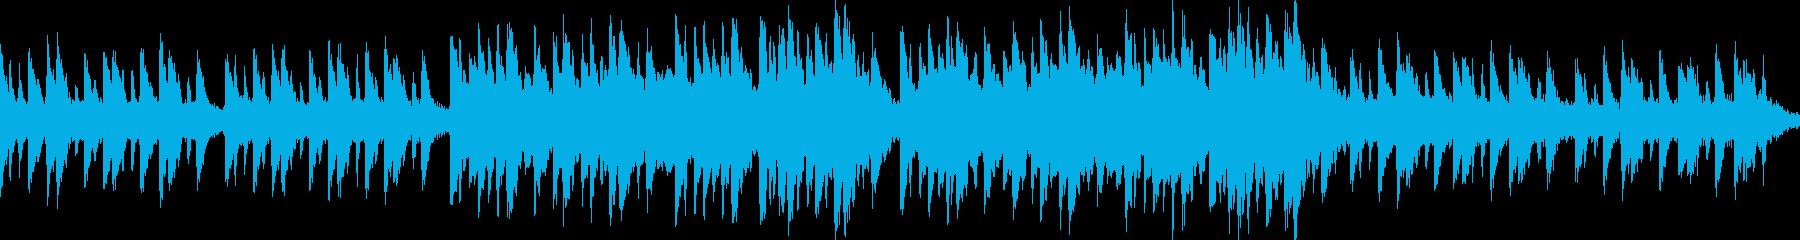 (Loop)和風バラードの再生済みの波形